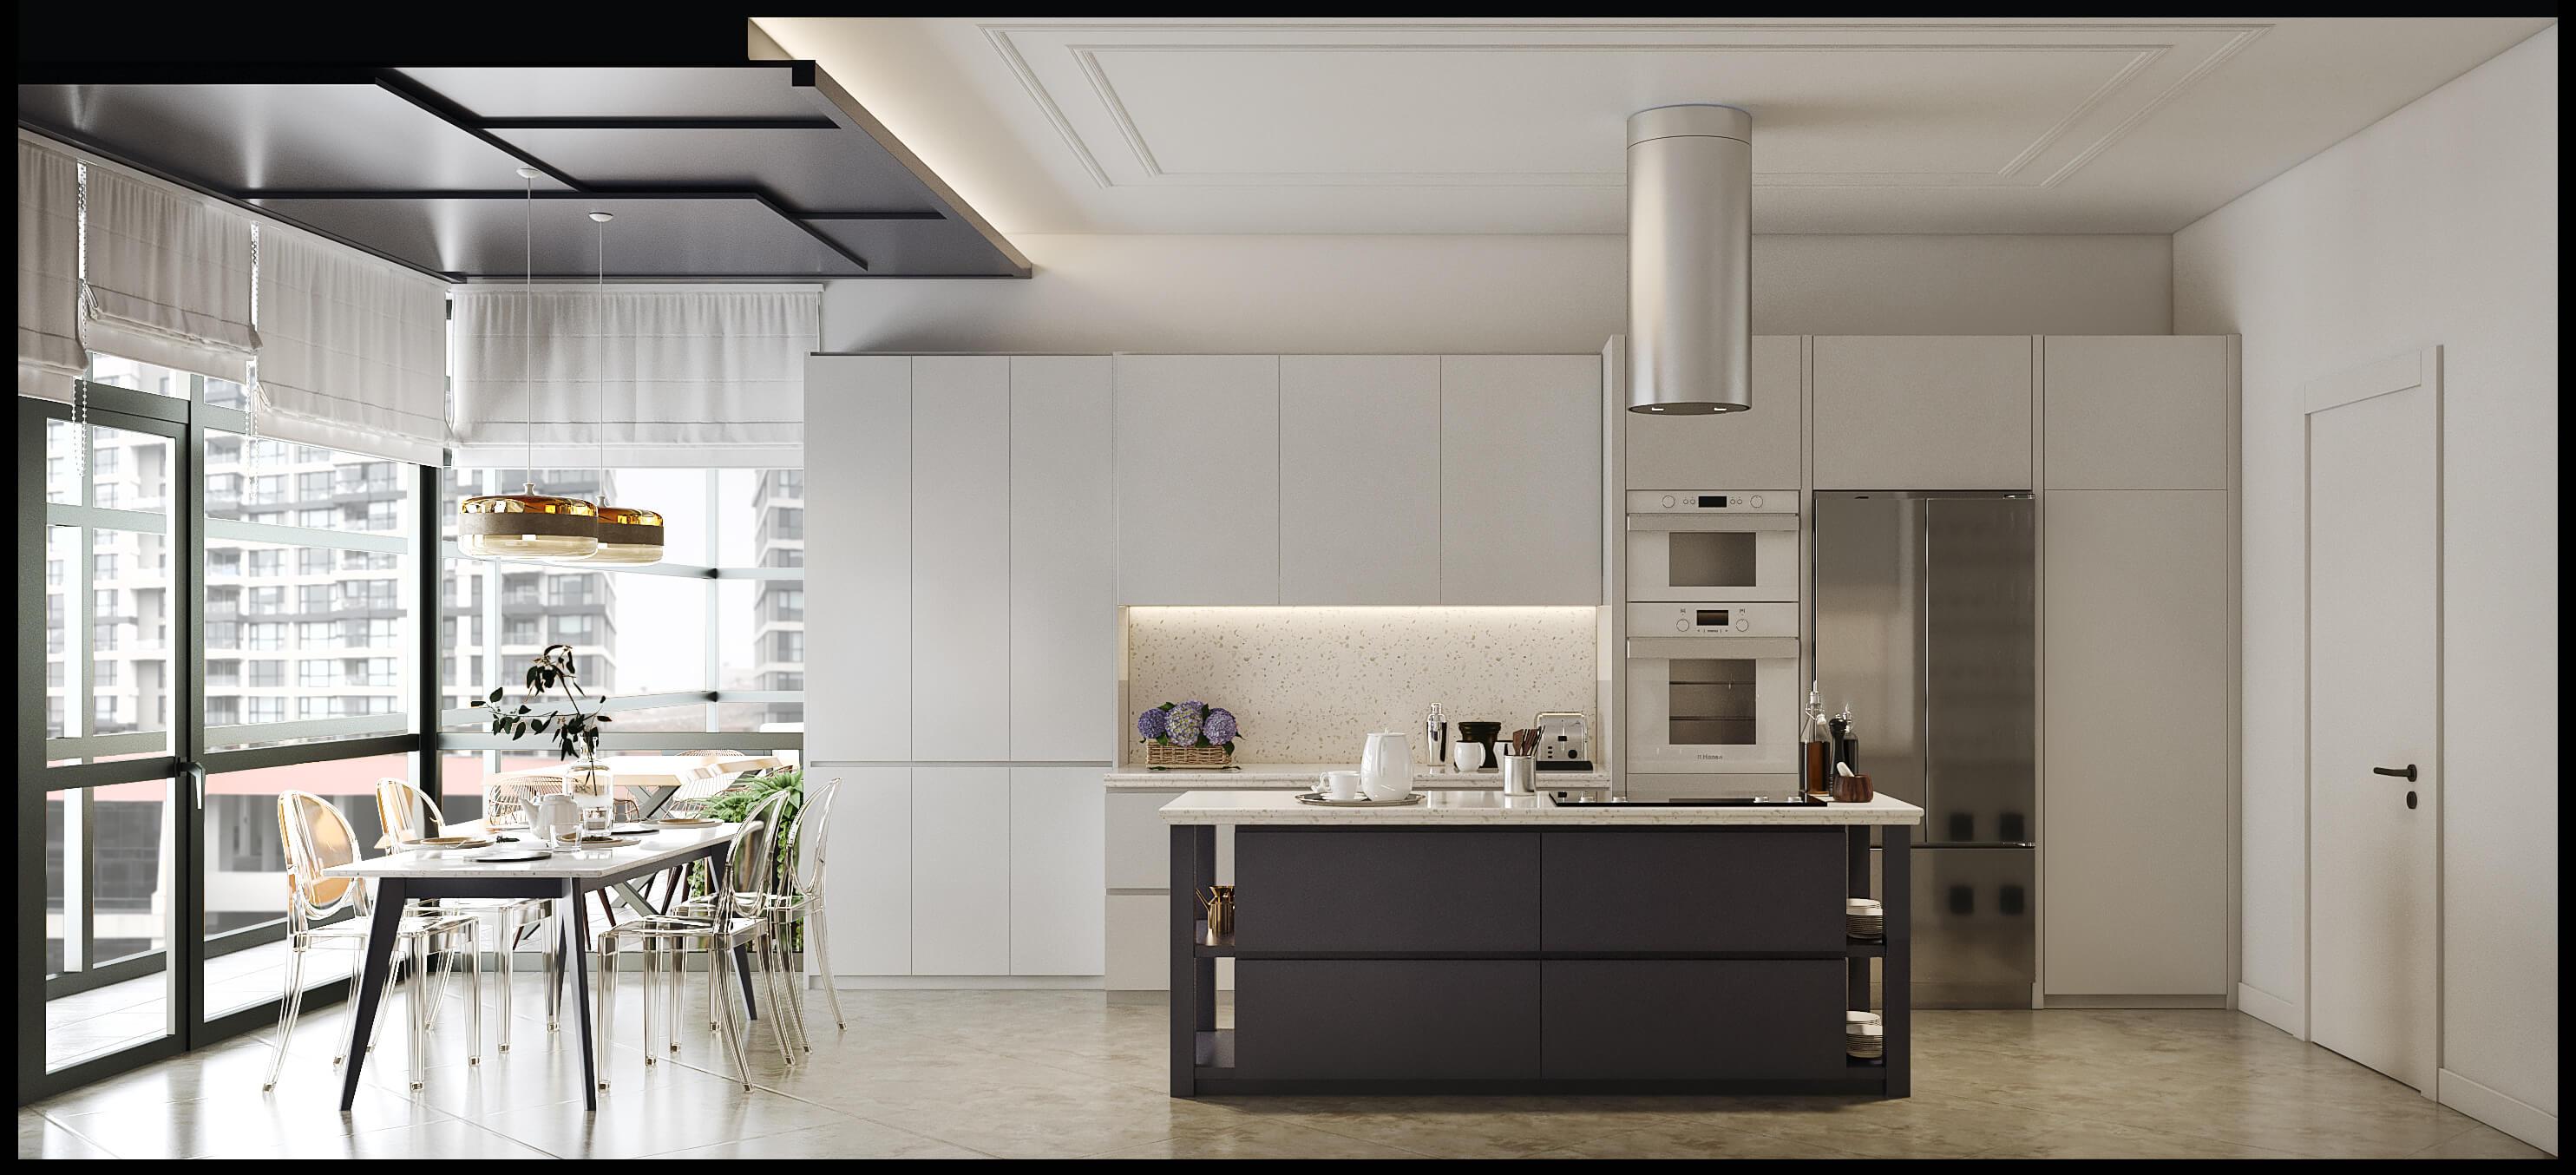 home inspiration 4482 Incek Prestij Dublex Apartment Residential